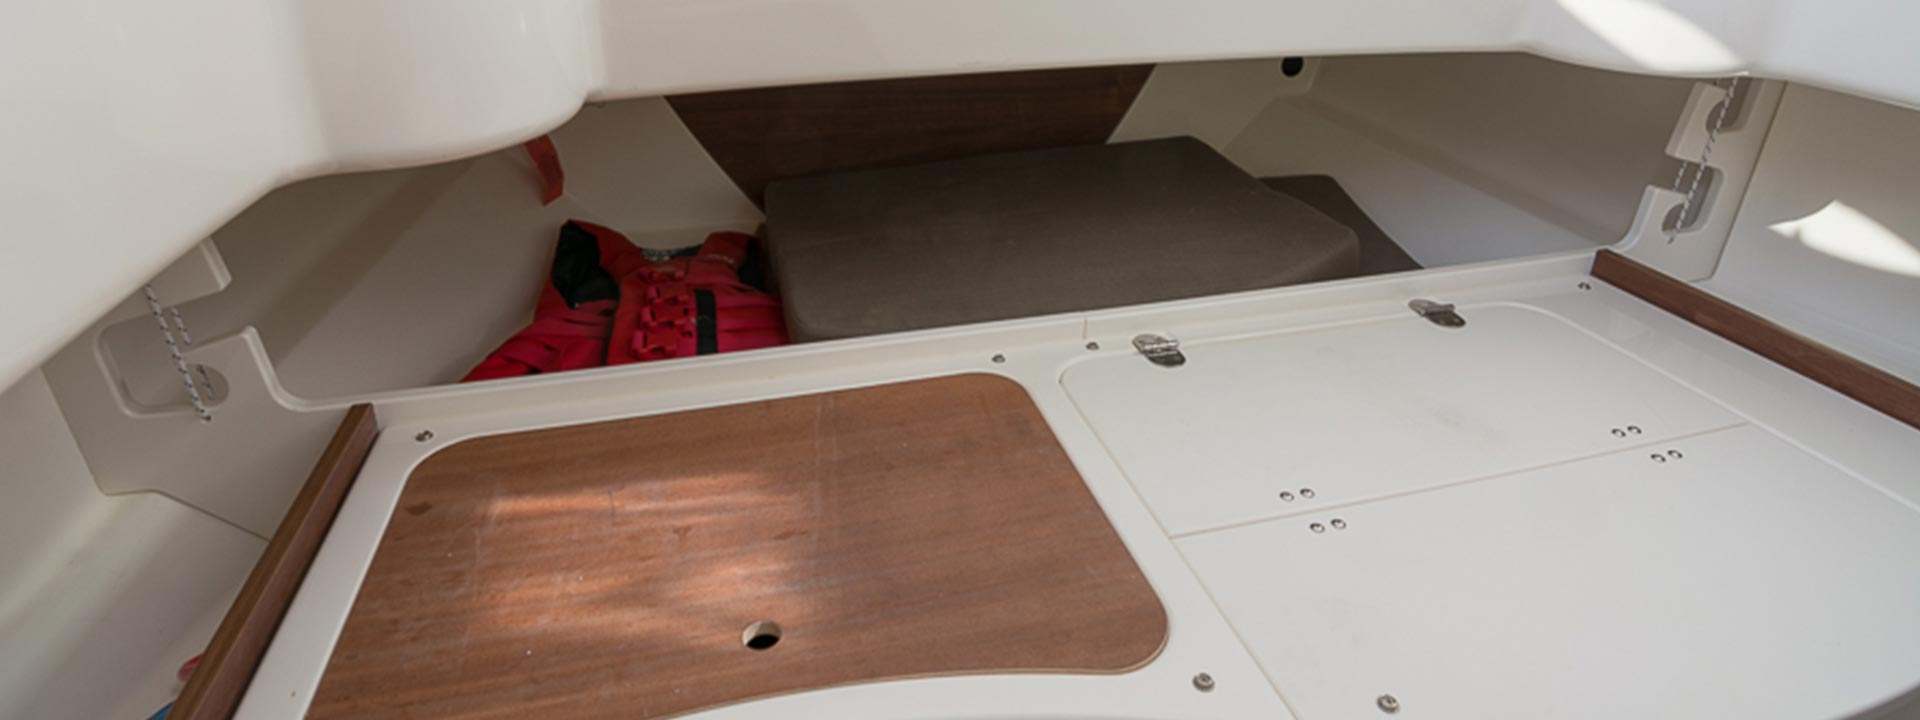 mayer-charter-boat-header-jeanneau-quicksilver-actv-805-04